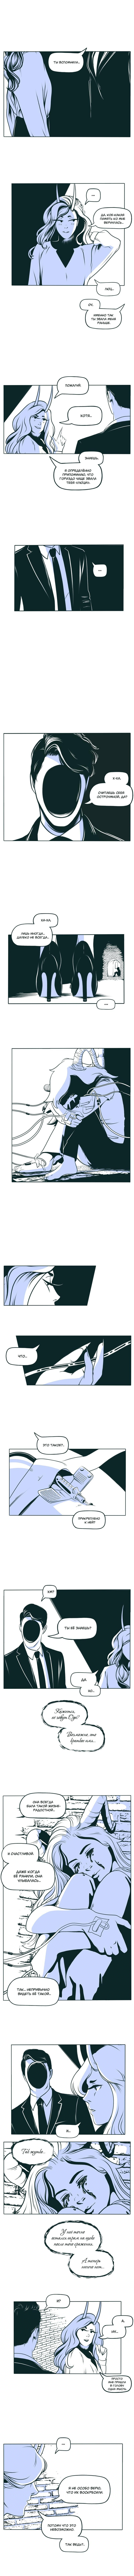 https://r1.ninemanga.com/comics/pic2/0/33536/420921/1534437741994.jpg Page 1